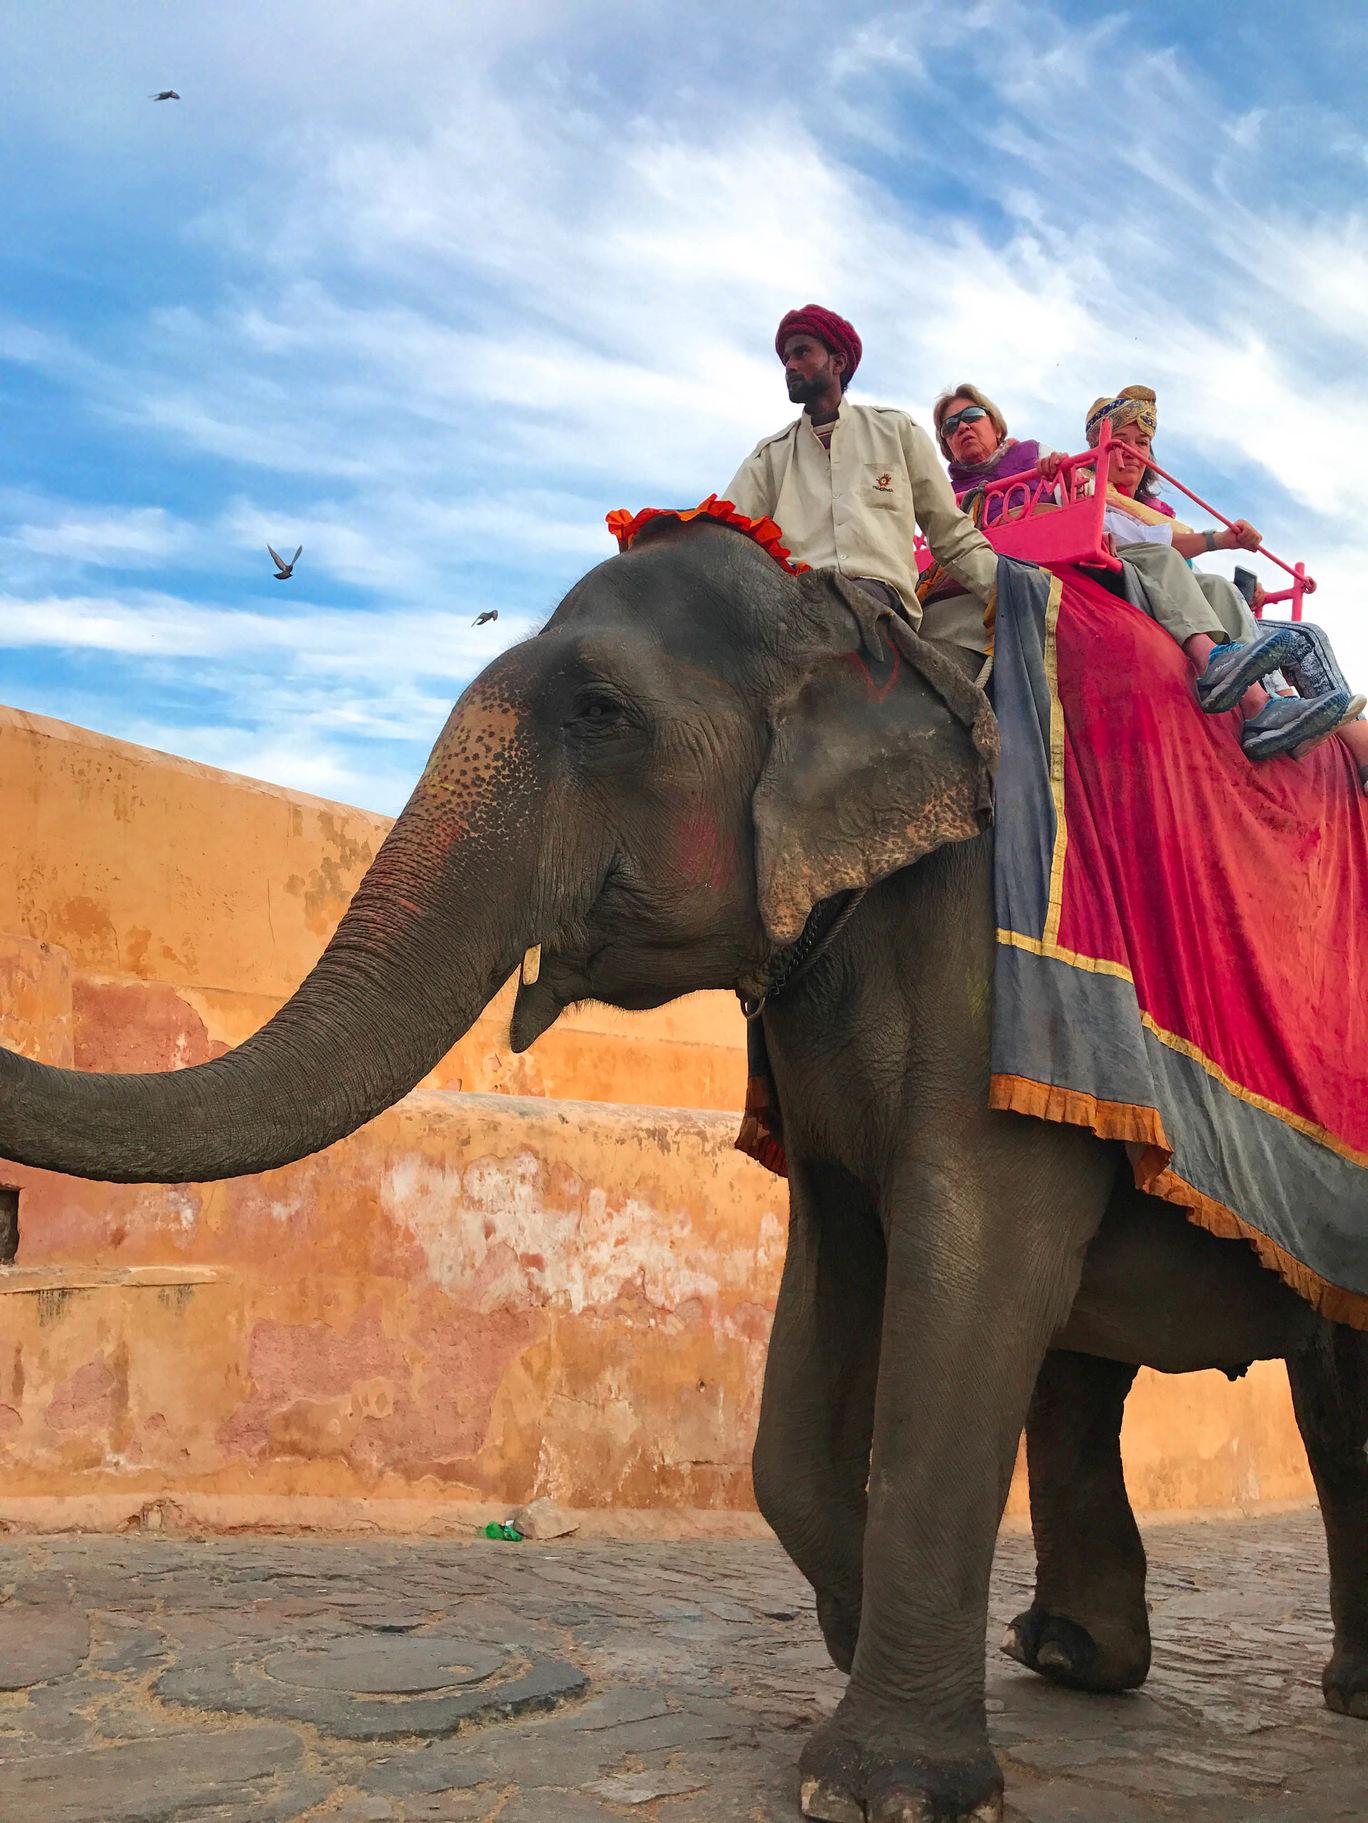 Photo of Jaipur By Purusottam Mohanty